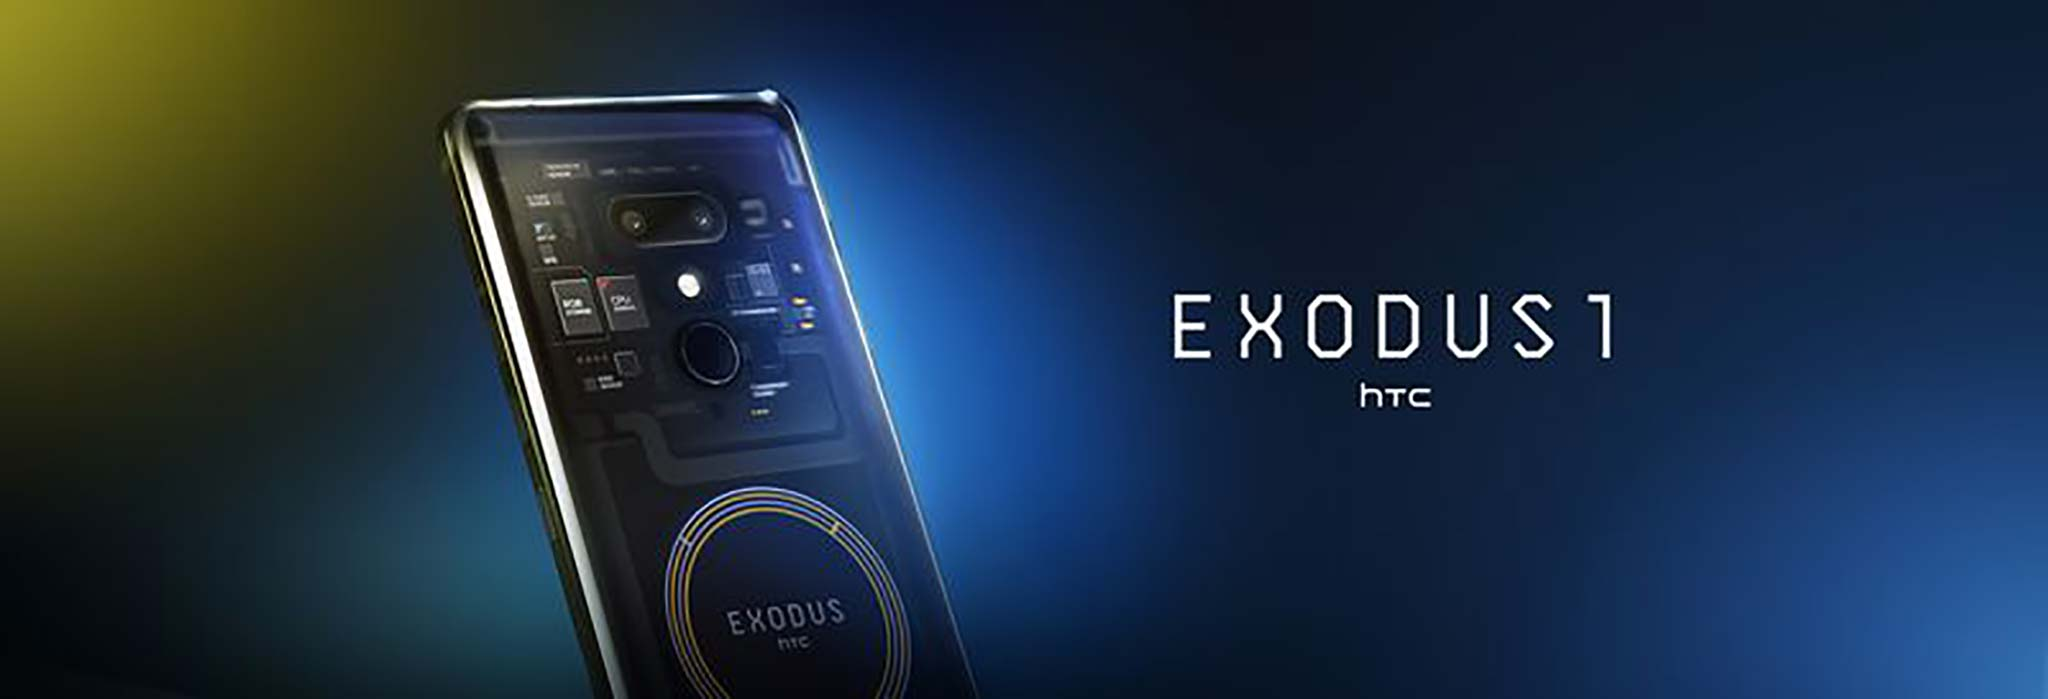 4460859_htc-exodus-1-4